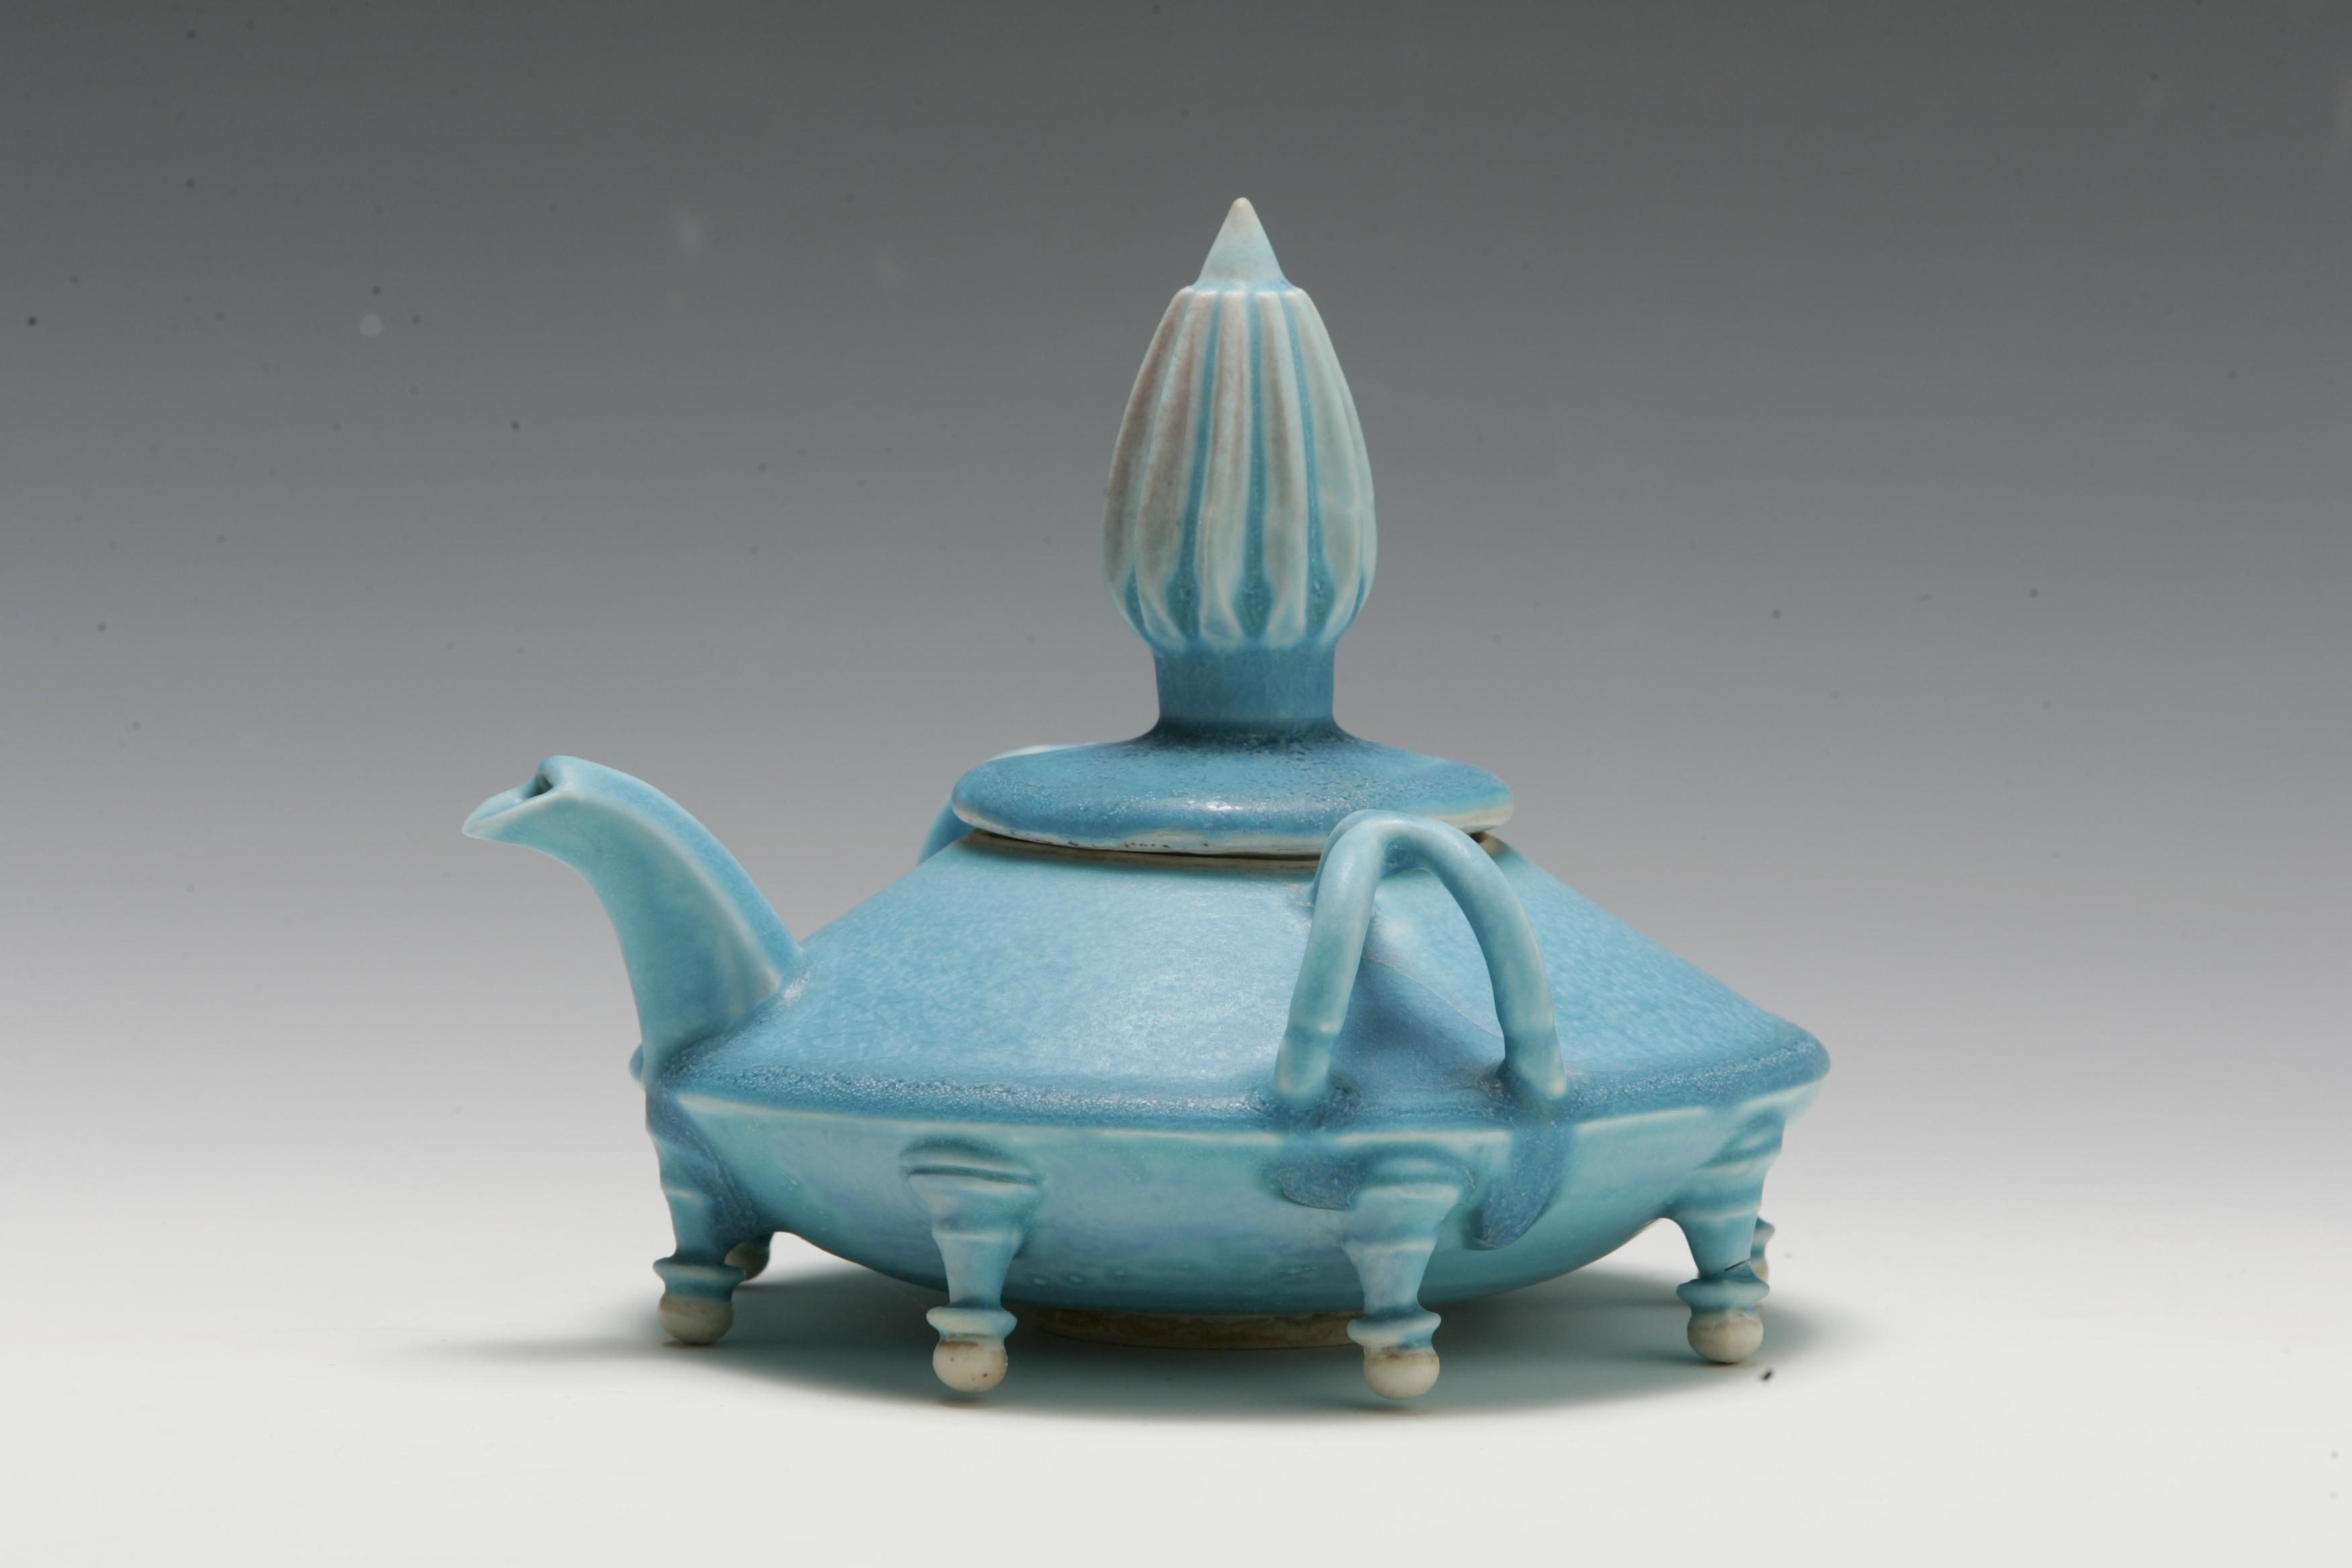 Spaceship Teapot | Tricia Ree McGuigan